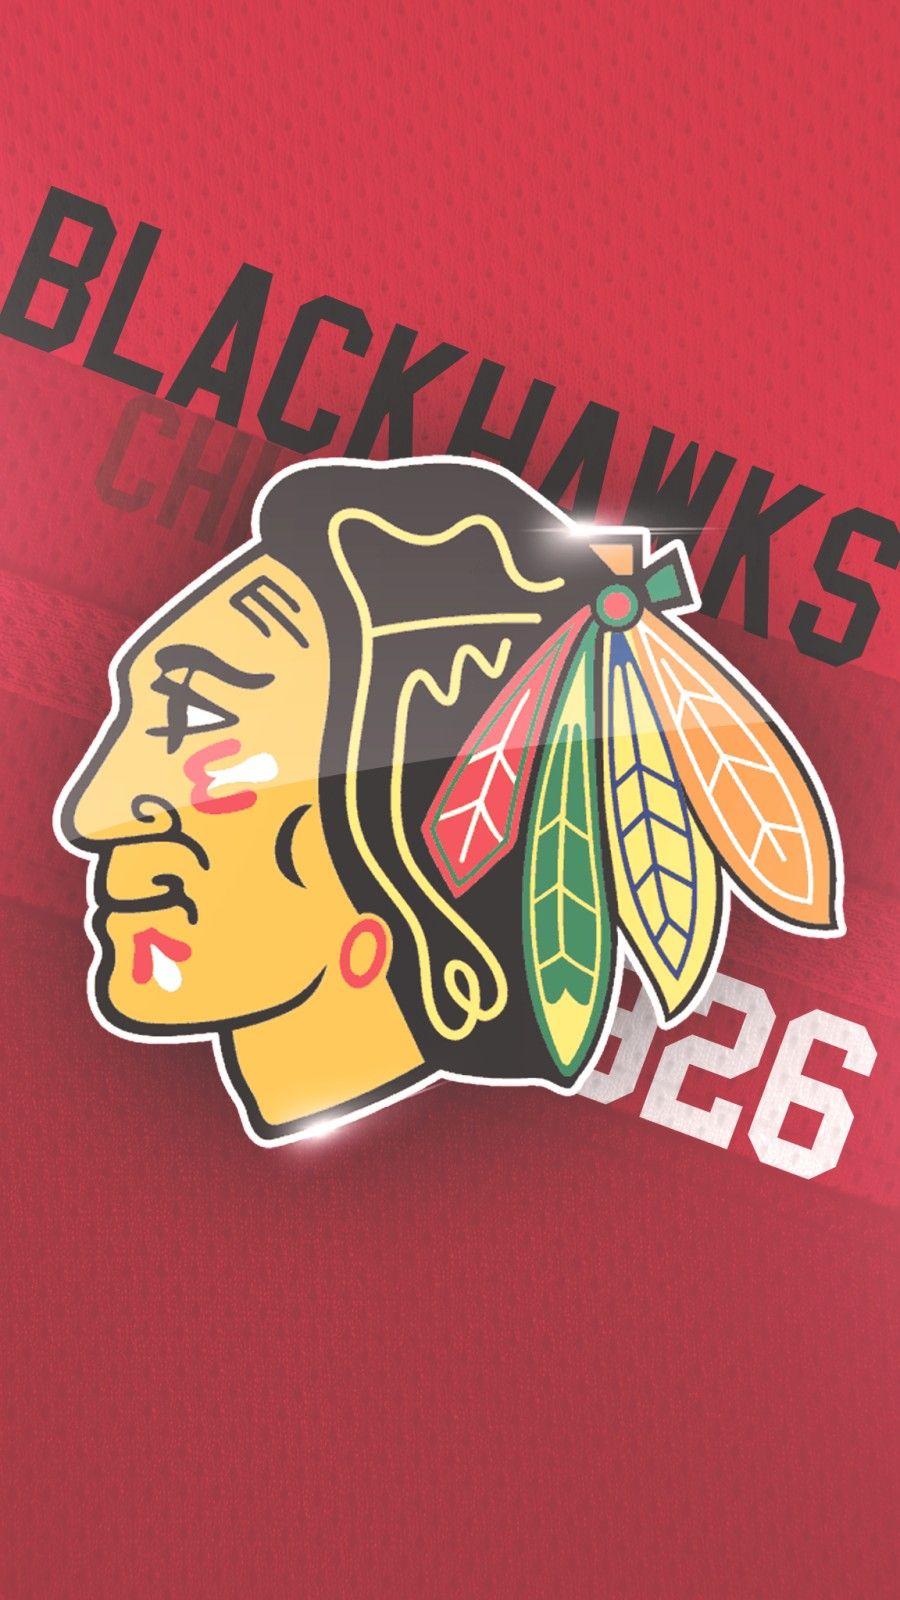 Blackhawks Iphone 7 Wallpaper 2021 Live Wallpaper Hd Chicago Blackhawks Wallpaper Blackhawks Iphone 7 Wallpapers